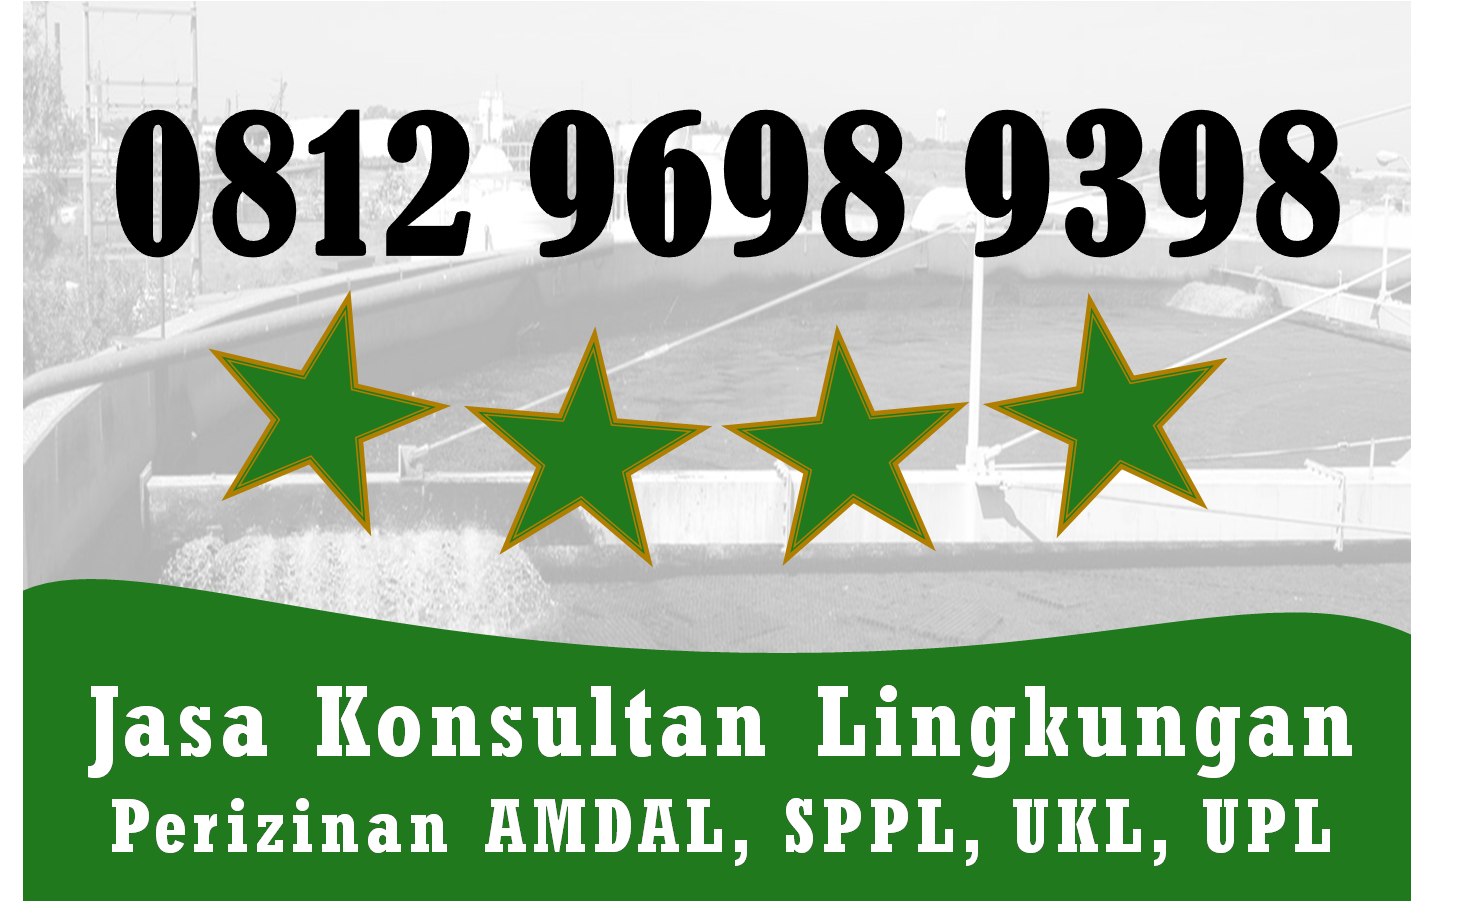 Order Sekarang Telp Wa 0812 9698 9398 Dokumen Ukl Upl Klinik Kab Bengkulu Utara Bengkulu Di 2020 Kota Bukittinggi Kendaraan Kota Perjalanan Kota